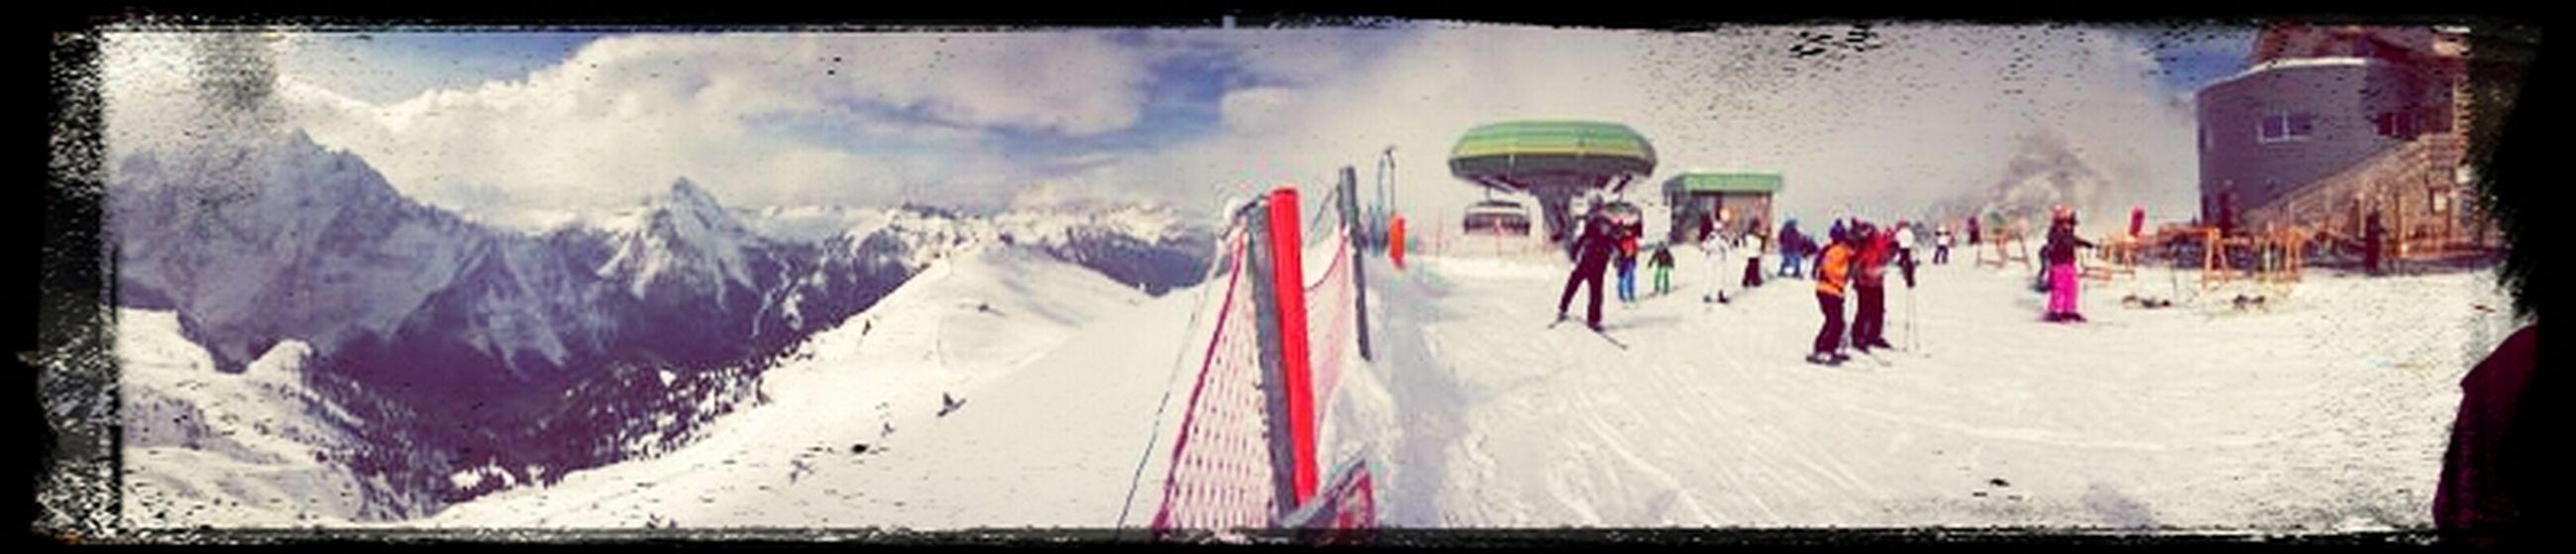 Snowboarding Hello World Italy Sellaronda